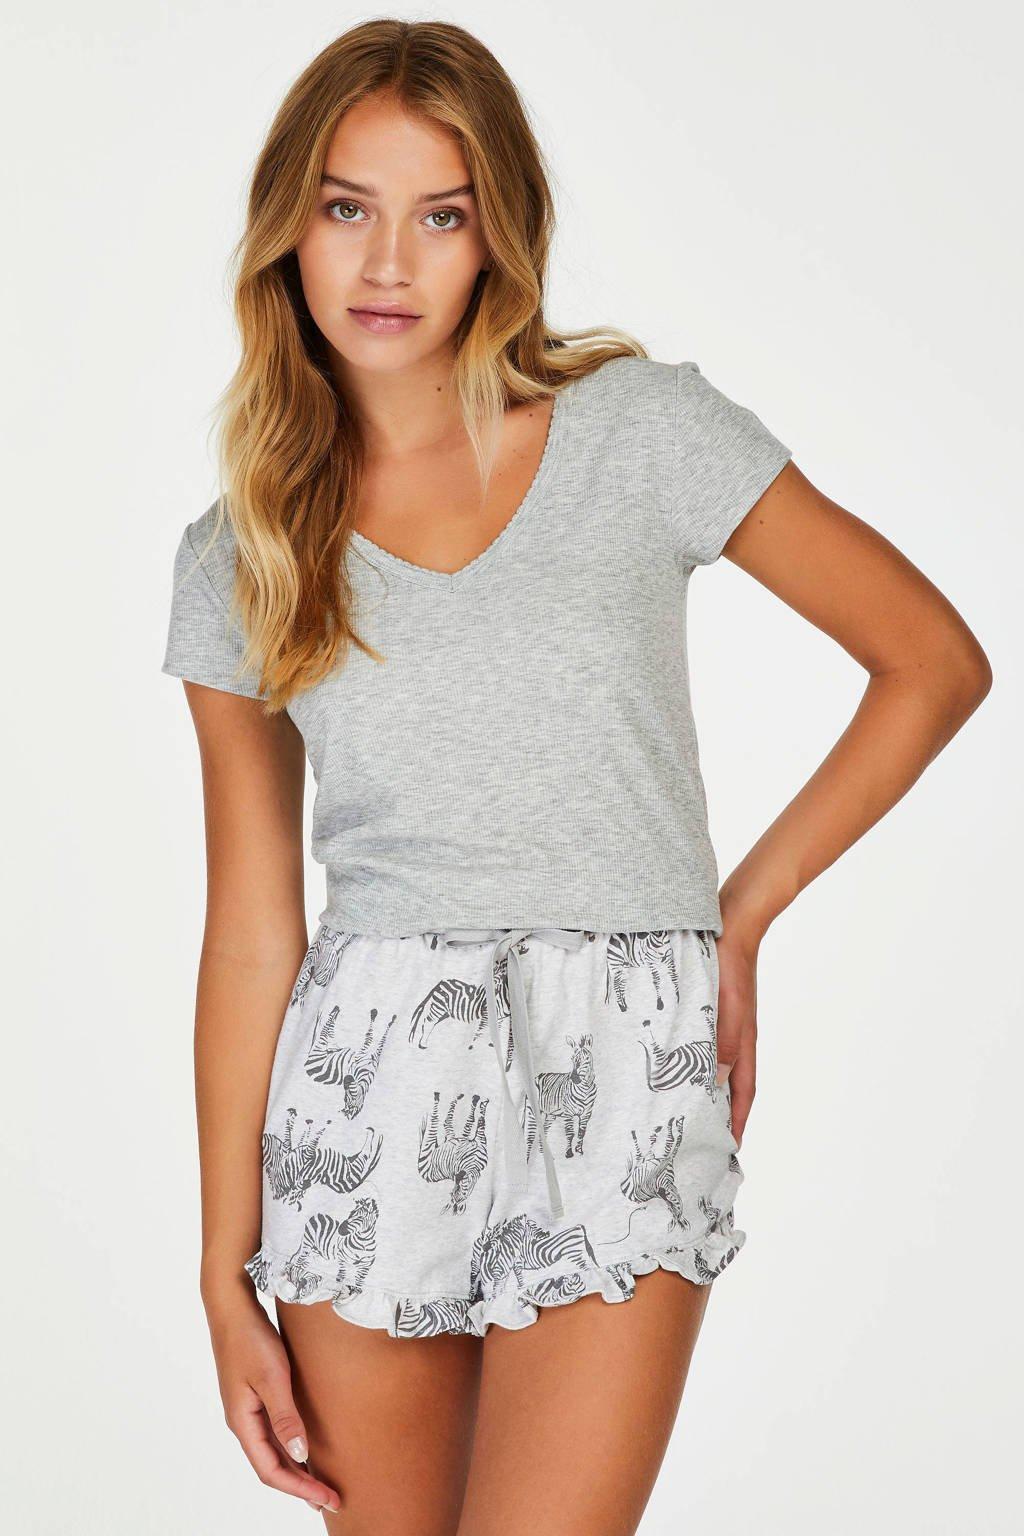 Hunkemöller pyjamatop met rib structuur grijs, Grijs